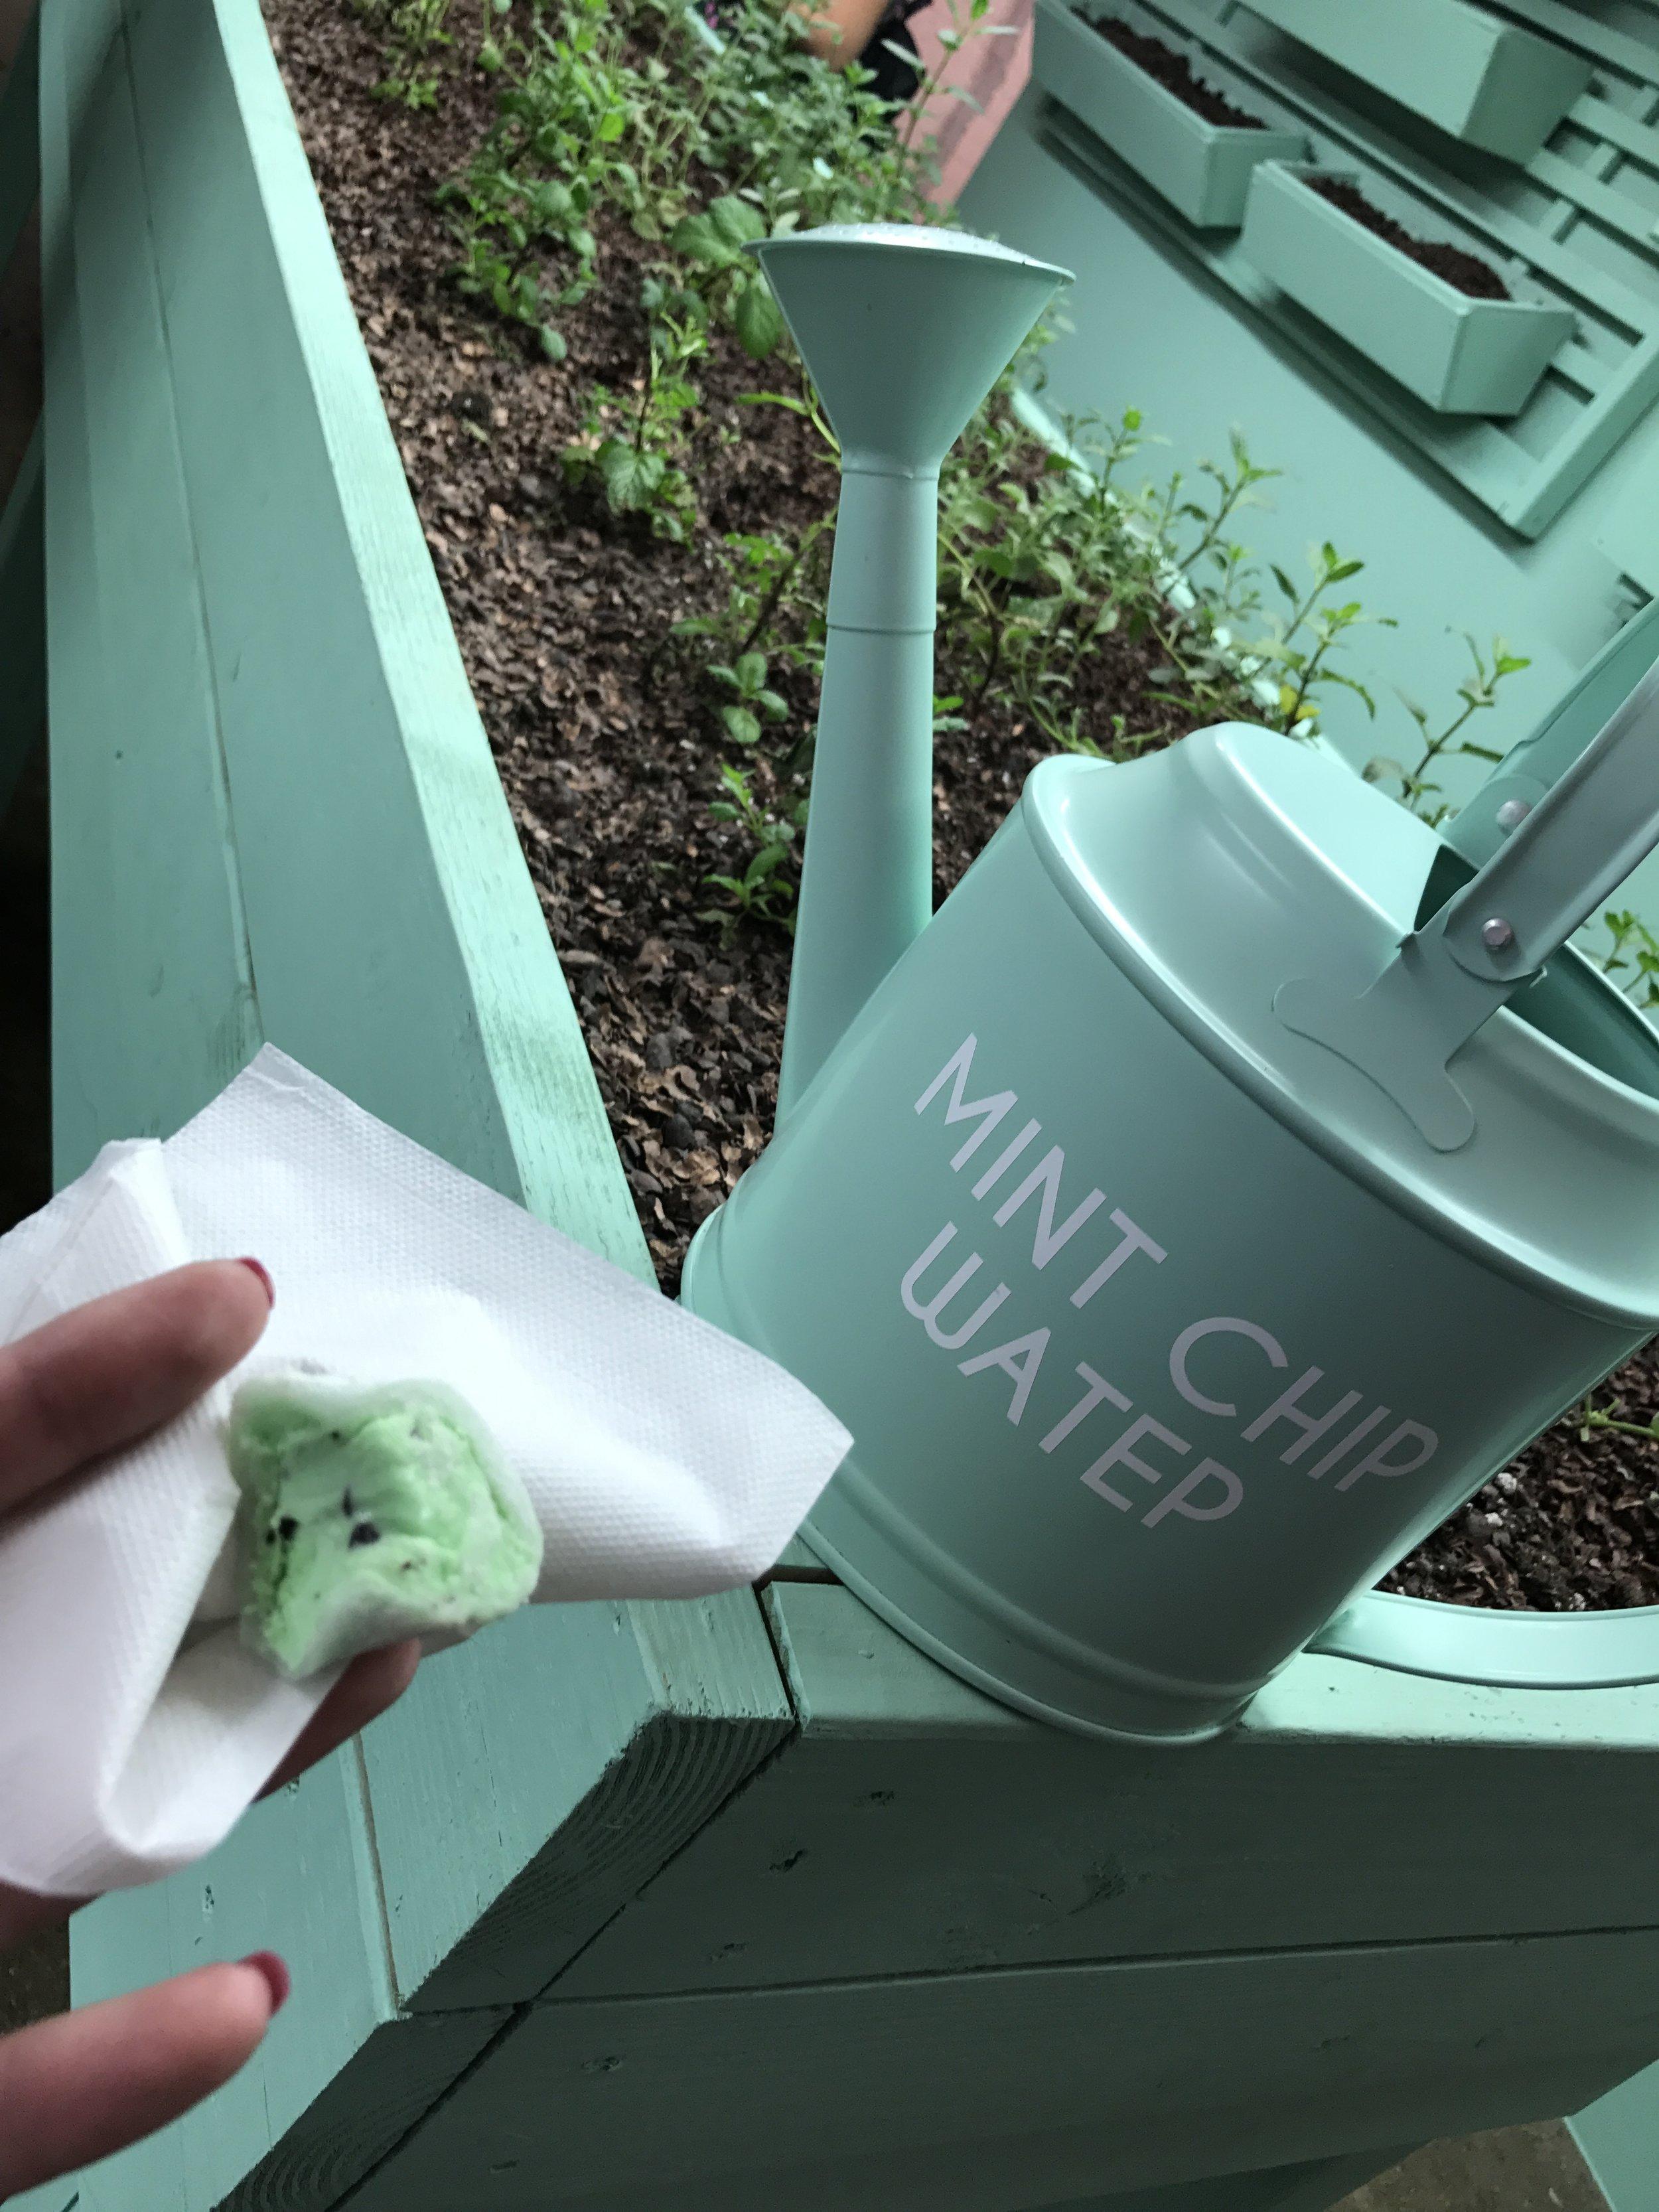 Mint Chip Life - Museum of Ice Cream Room